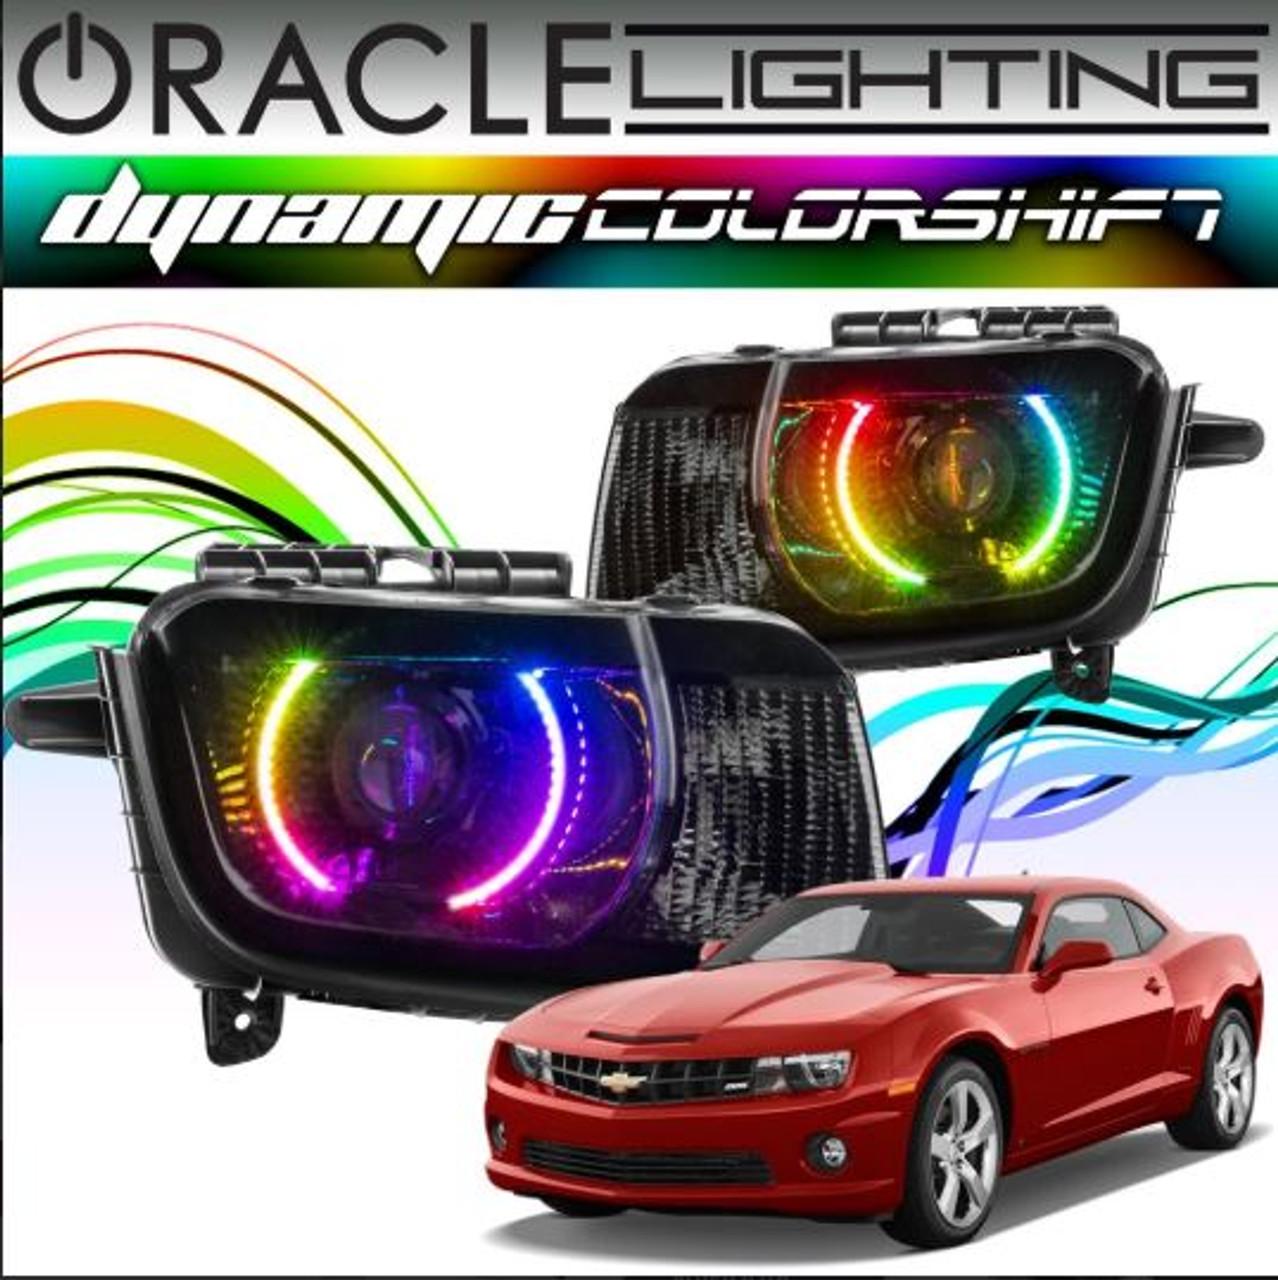 2010 2013 Chevrolet Camaro Oracle Dynamic Colorshift Headlight Halo Kit